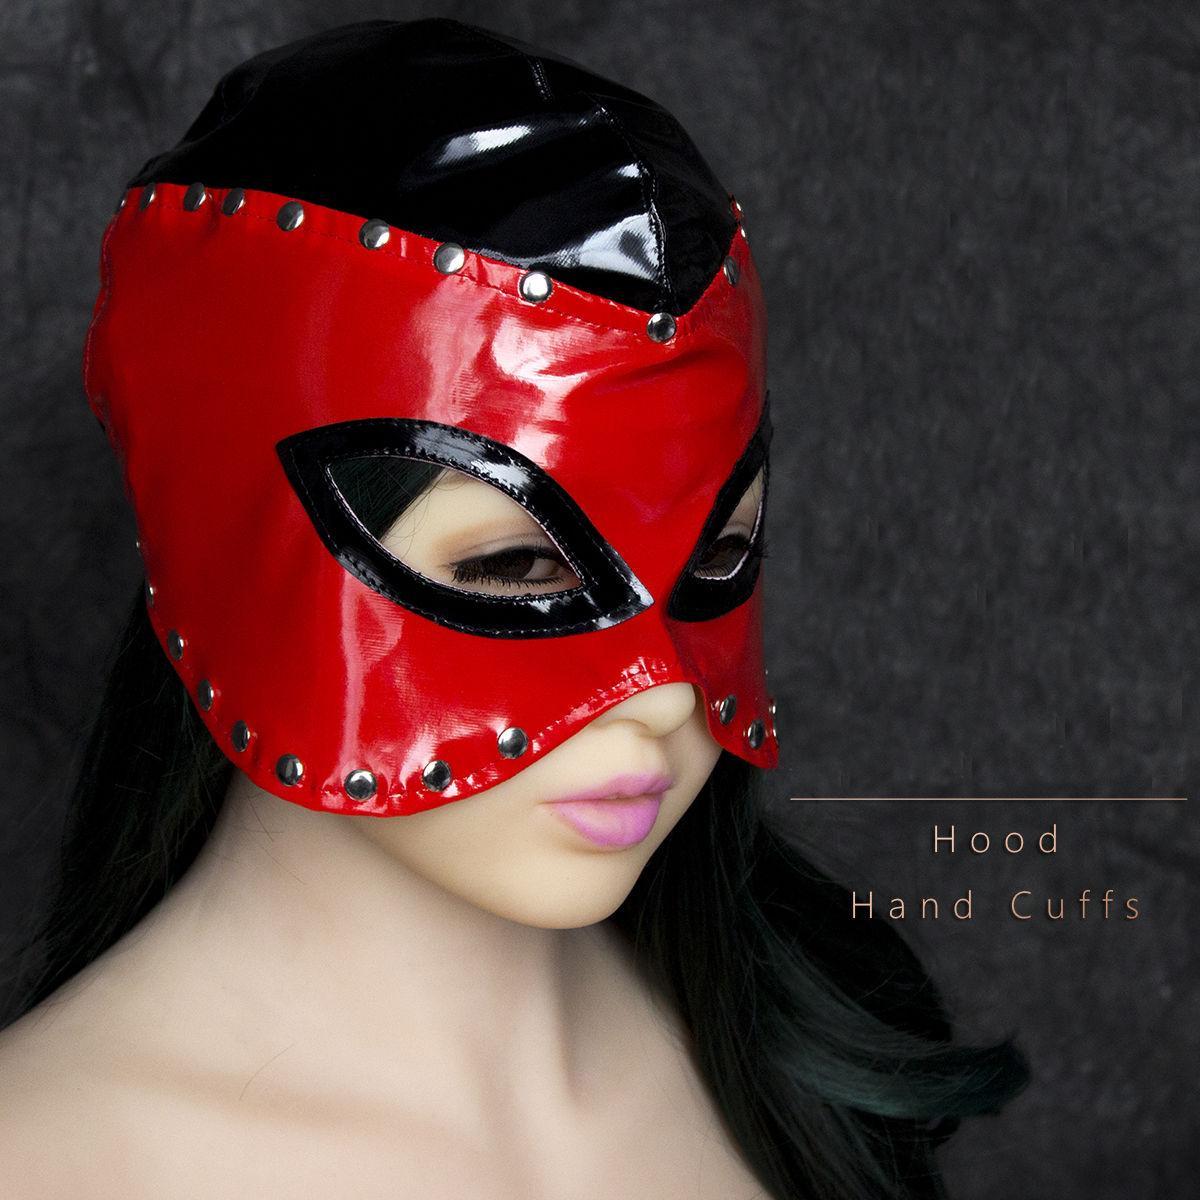 Capa de Couro Cravejado GIMP Máscara Fetish Rainha Fetish Roleplay Partido Traje TT15 # R501